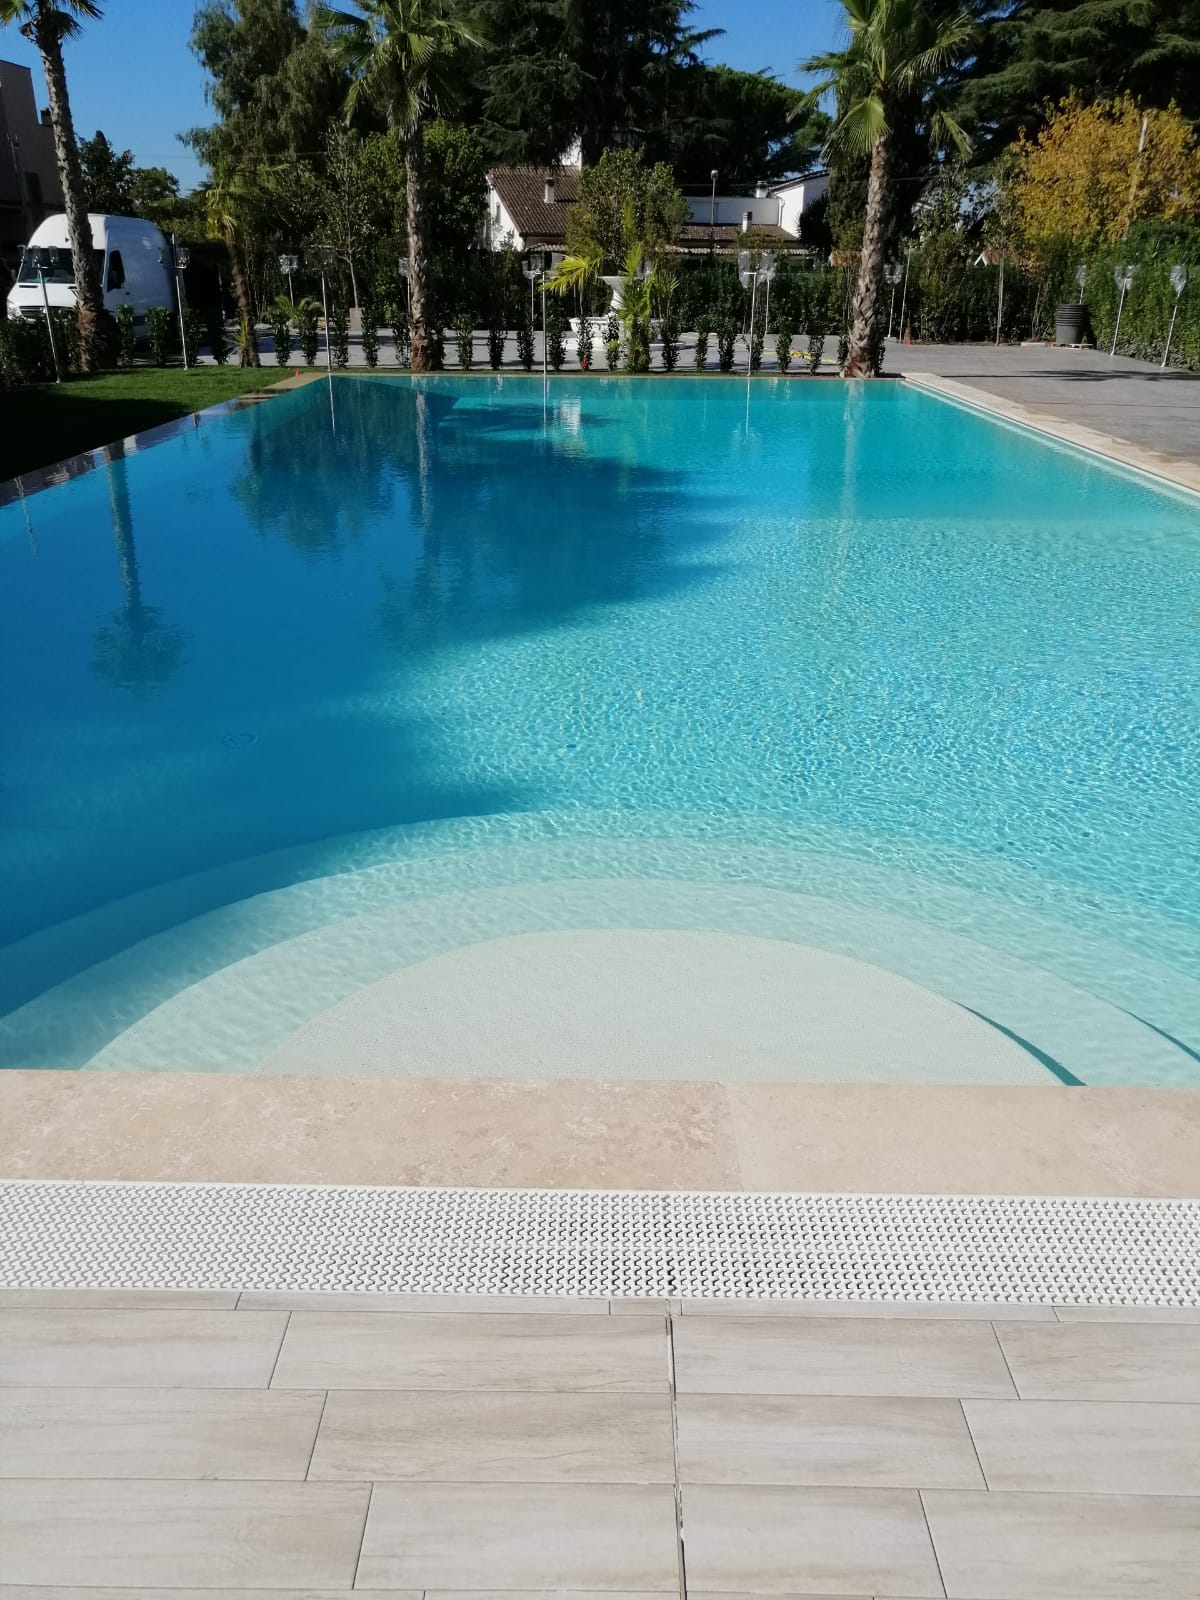 Piscine Sfioro A Cascata piscina con sfioro a cascata piscina con sfioro a cascata